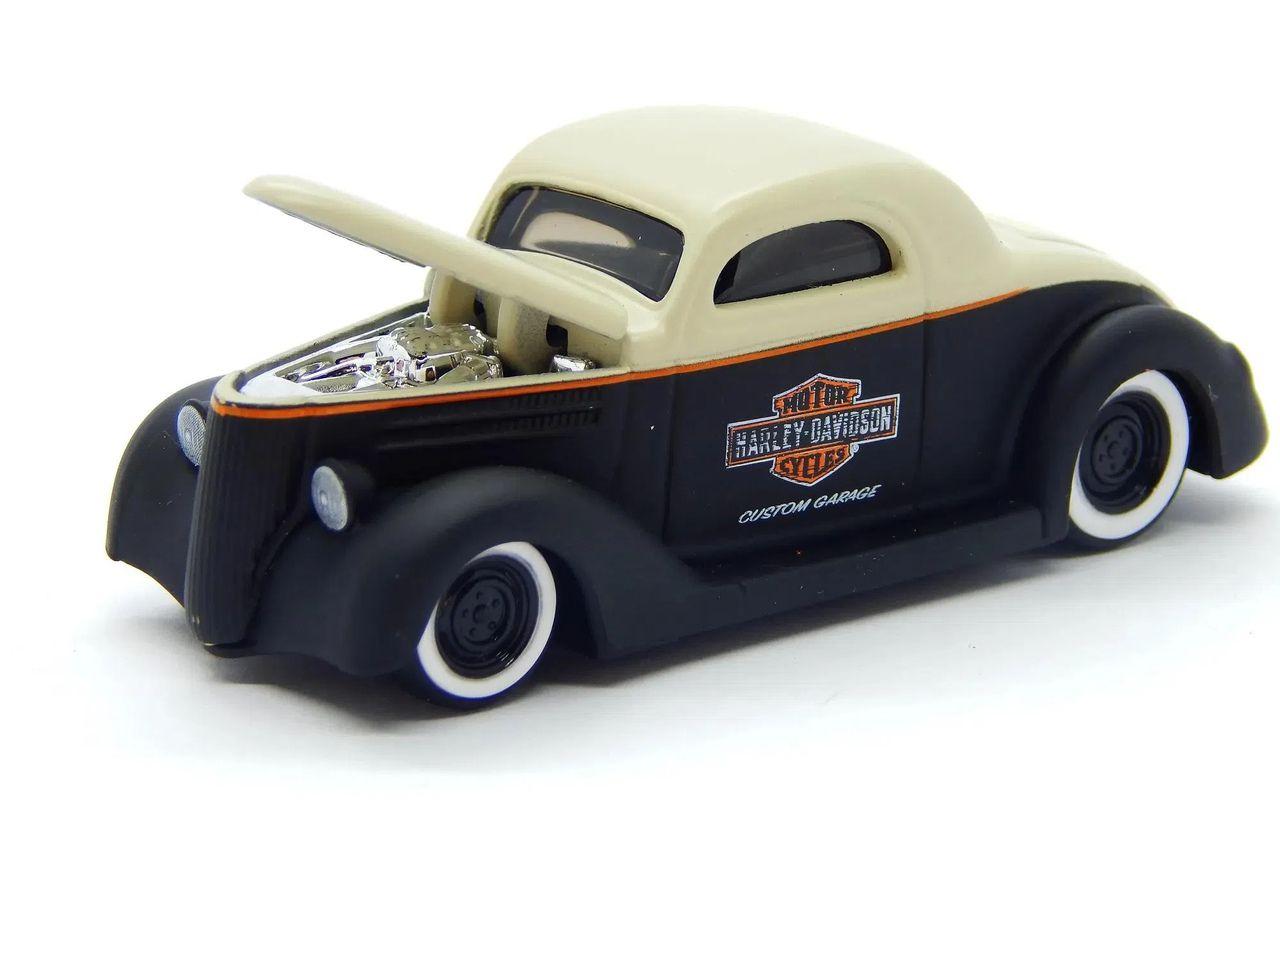 Miniatura 1936 Ford Coupe: Harley Davidson (Escala 1/64) - Maisco